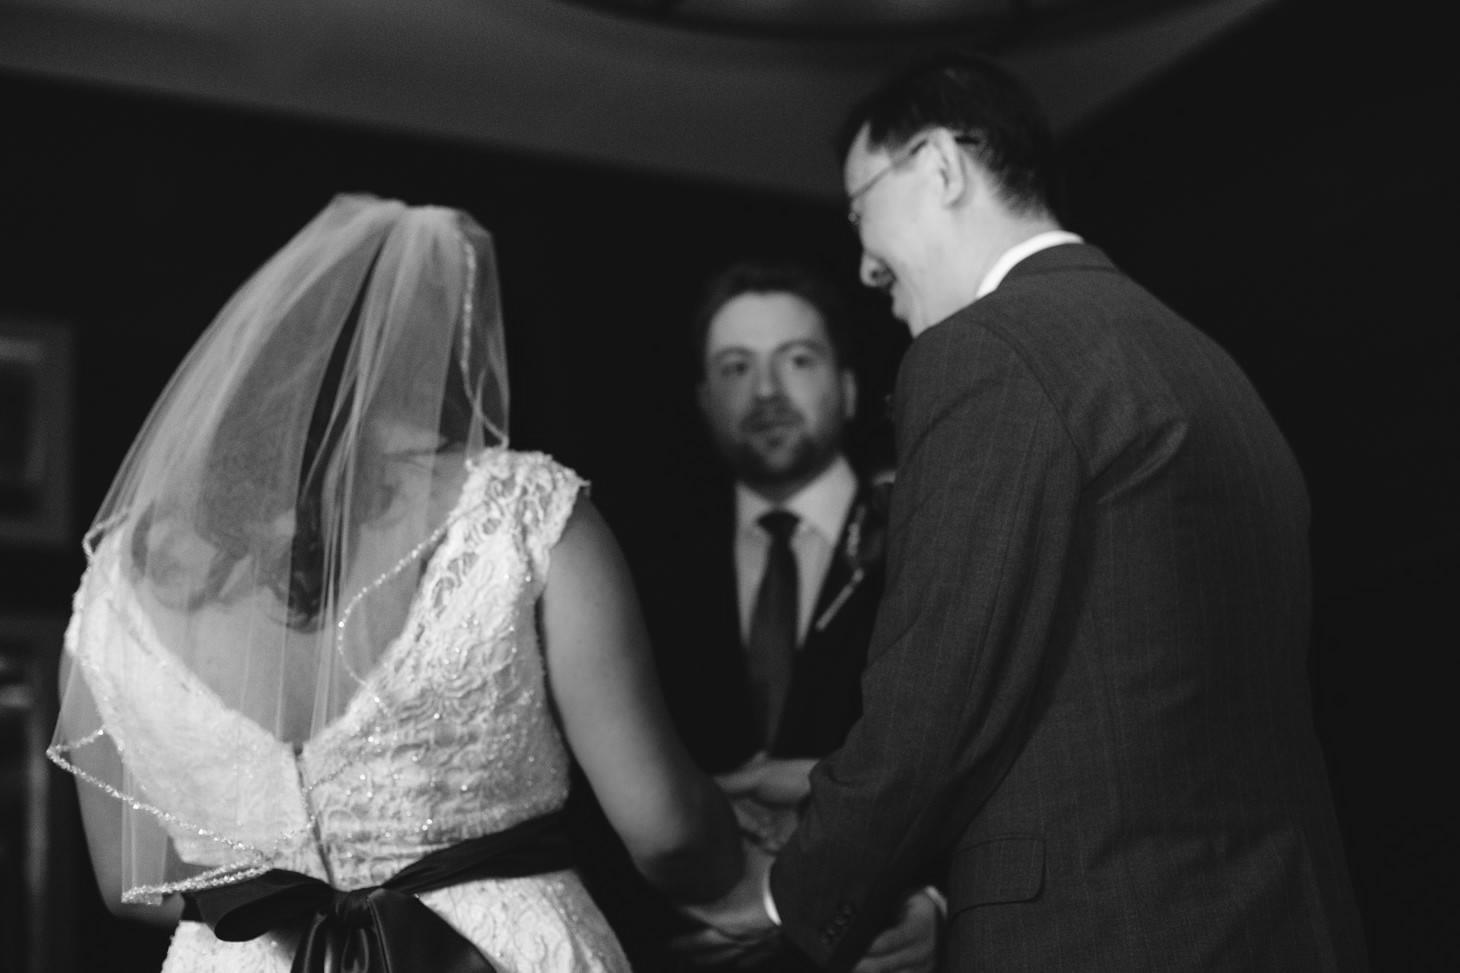 033-nyc-wedding-portrait-photographer-times-square-muse-hotel-winter-wedding-smitten-chickens.jpg